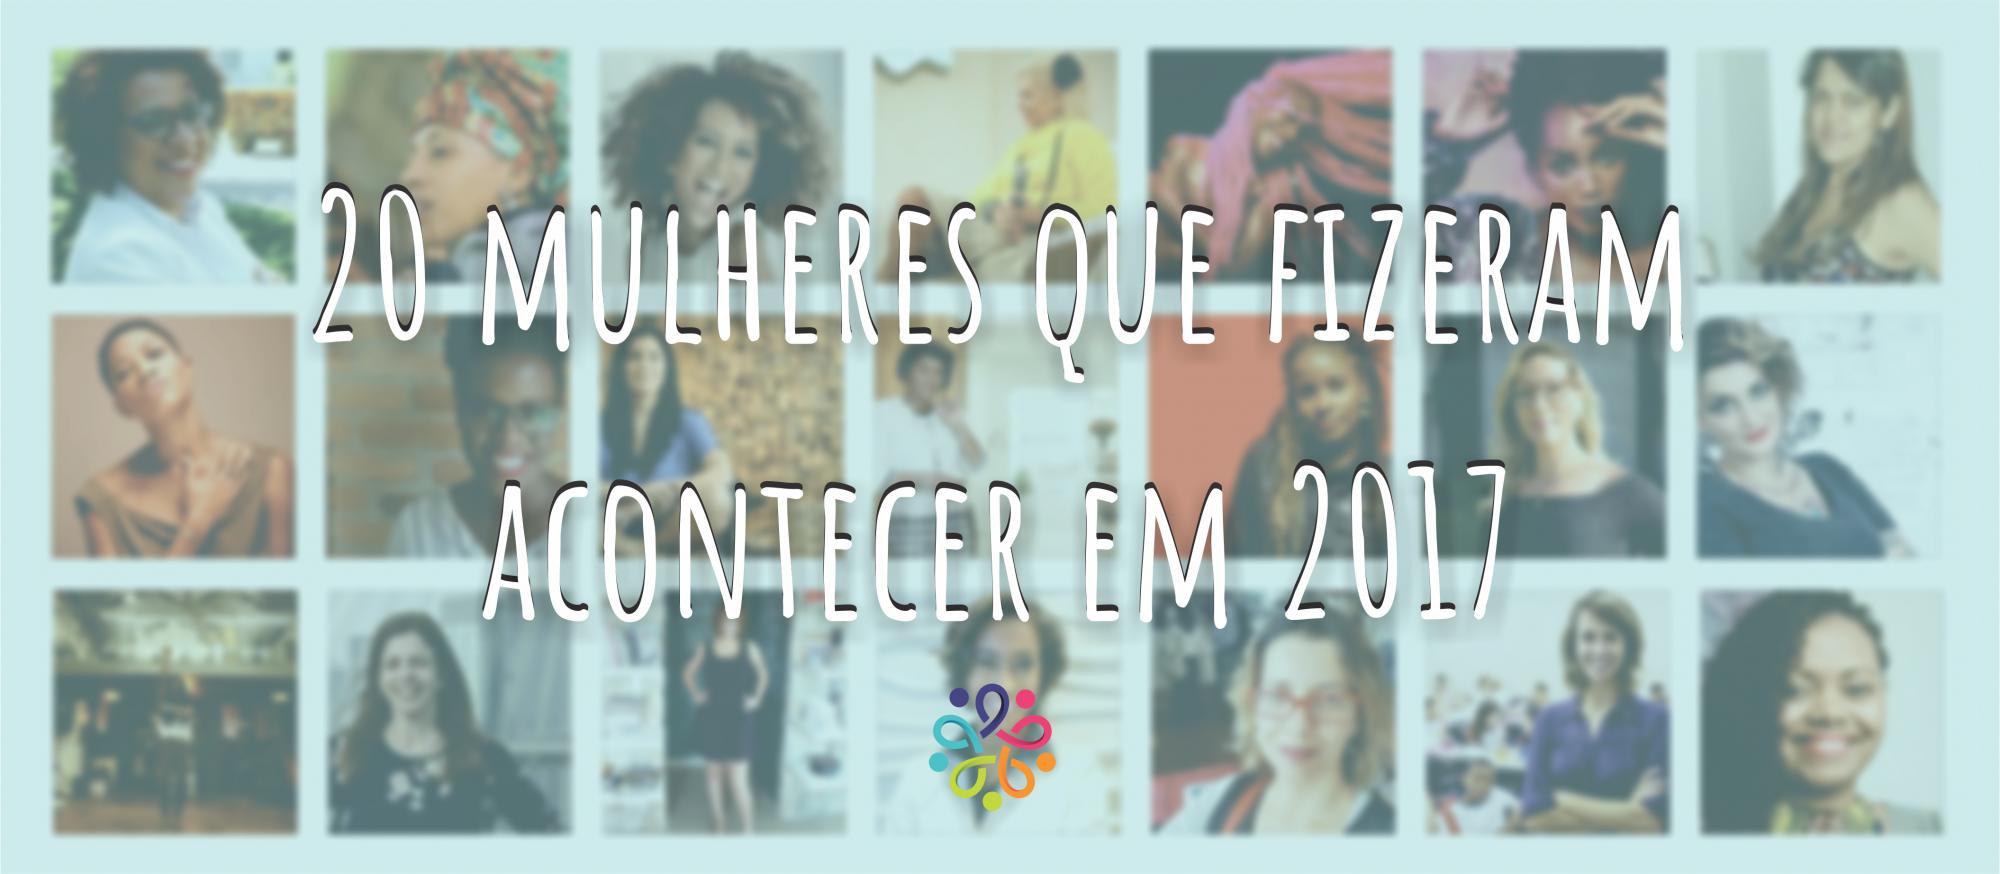 20 mulheres 2017